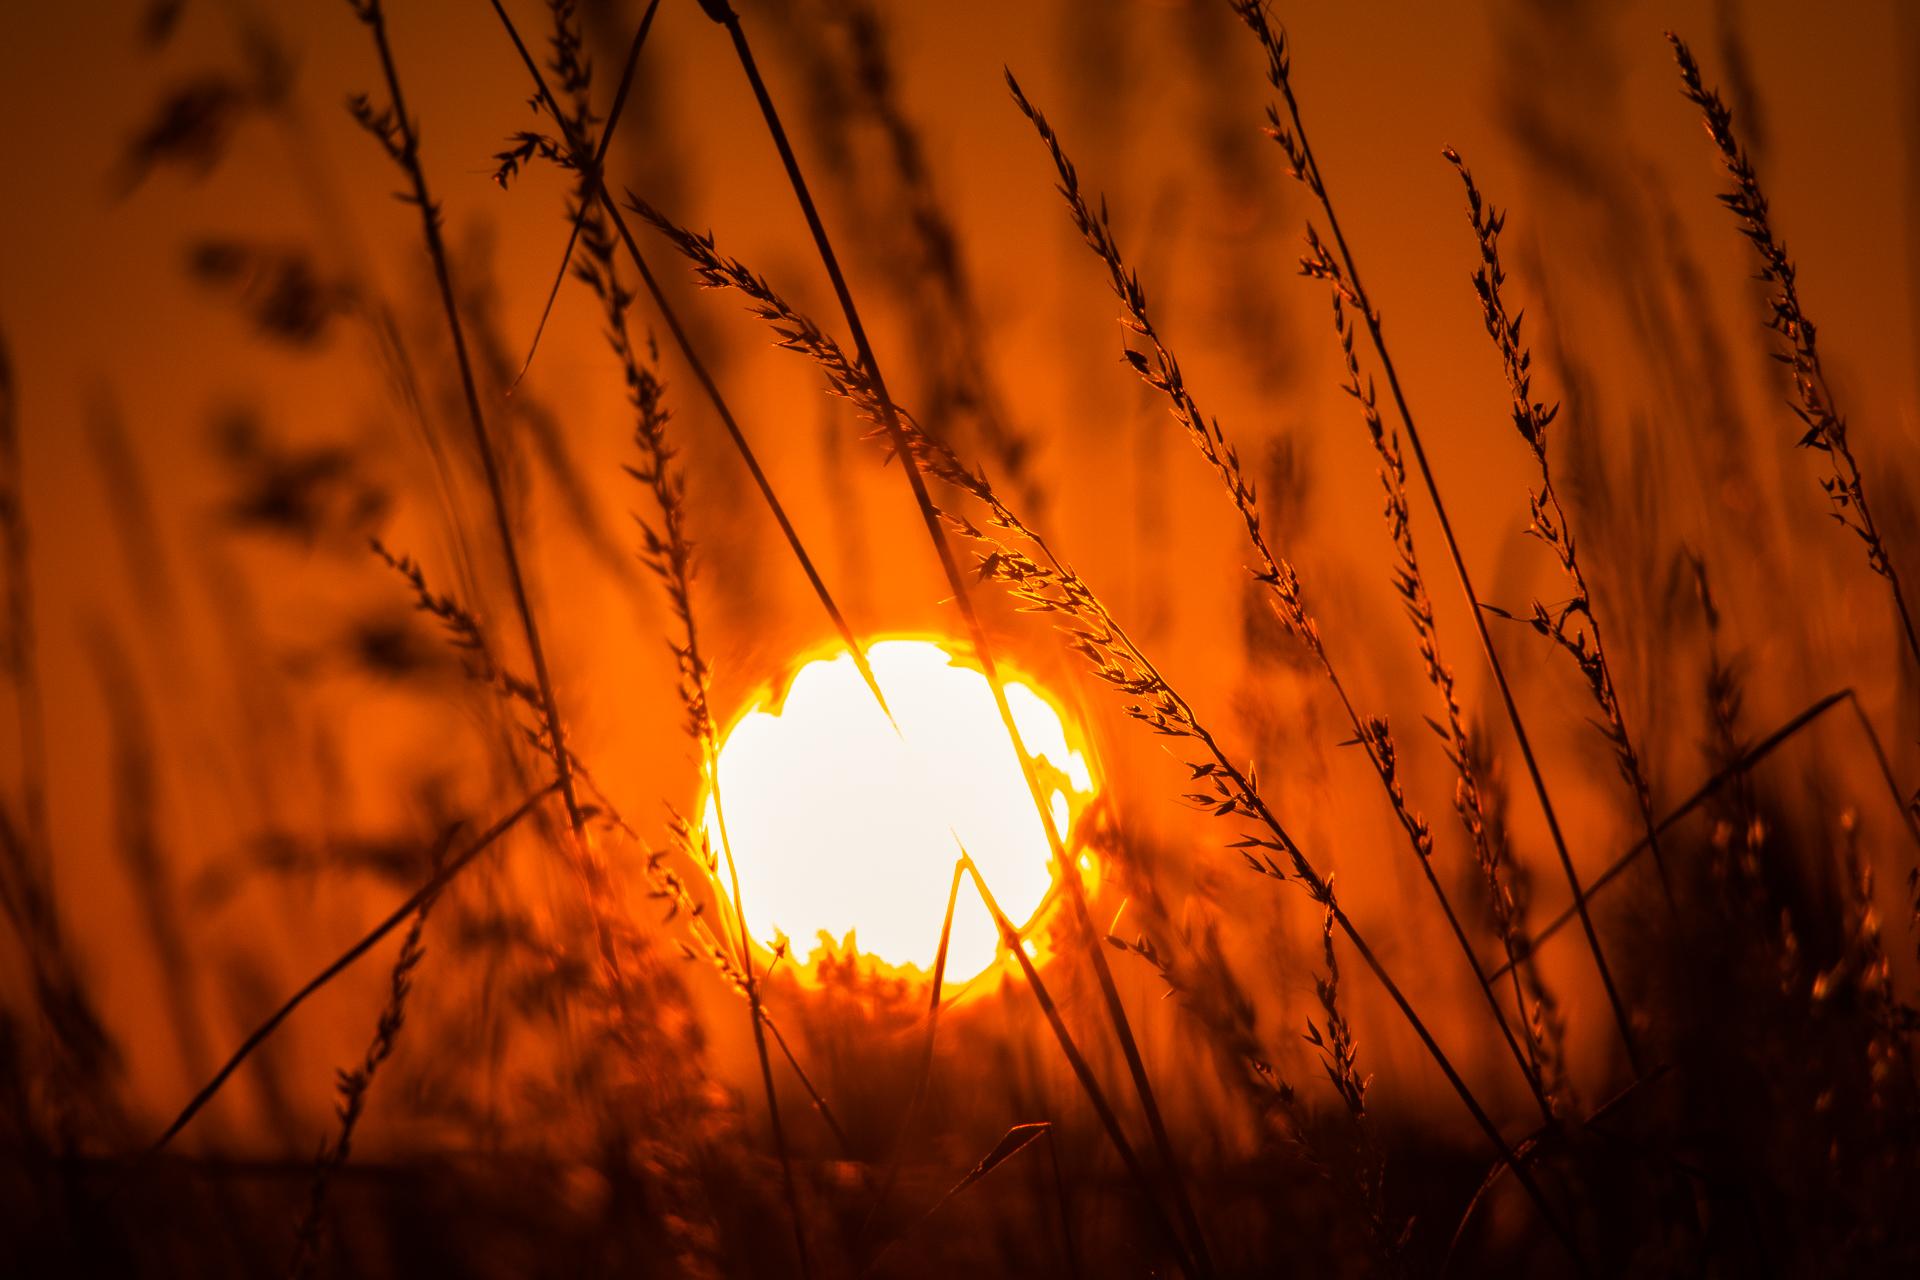 2018-07-07-Sonnenuntergang1.jpg